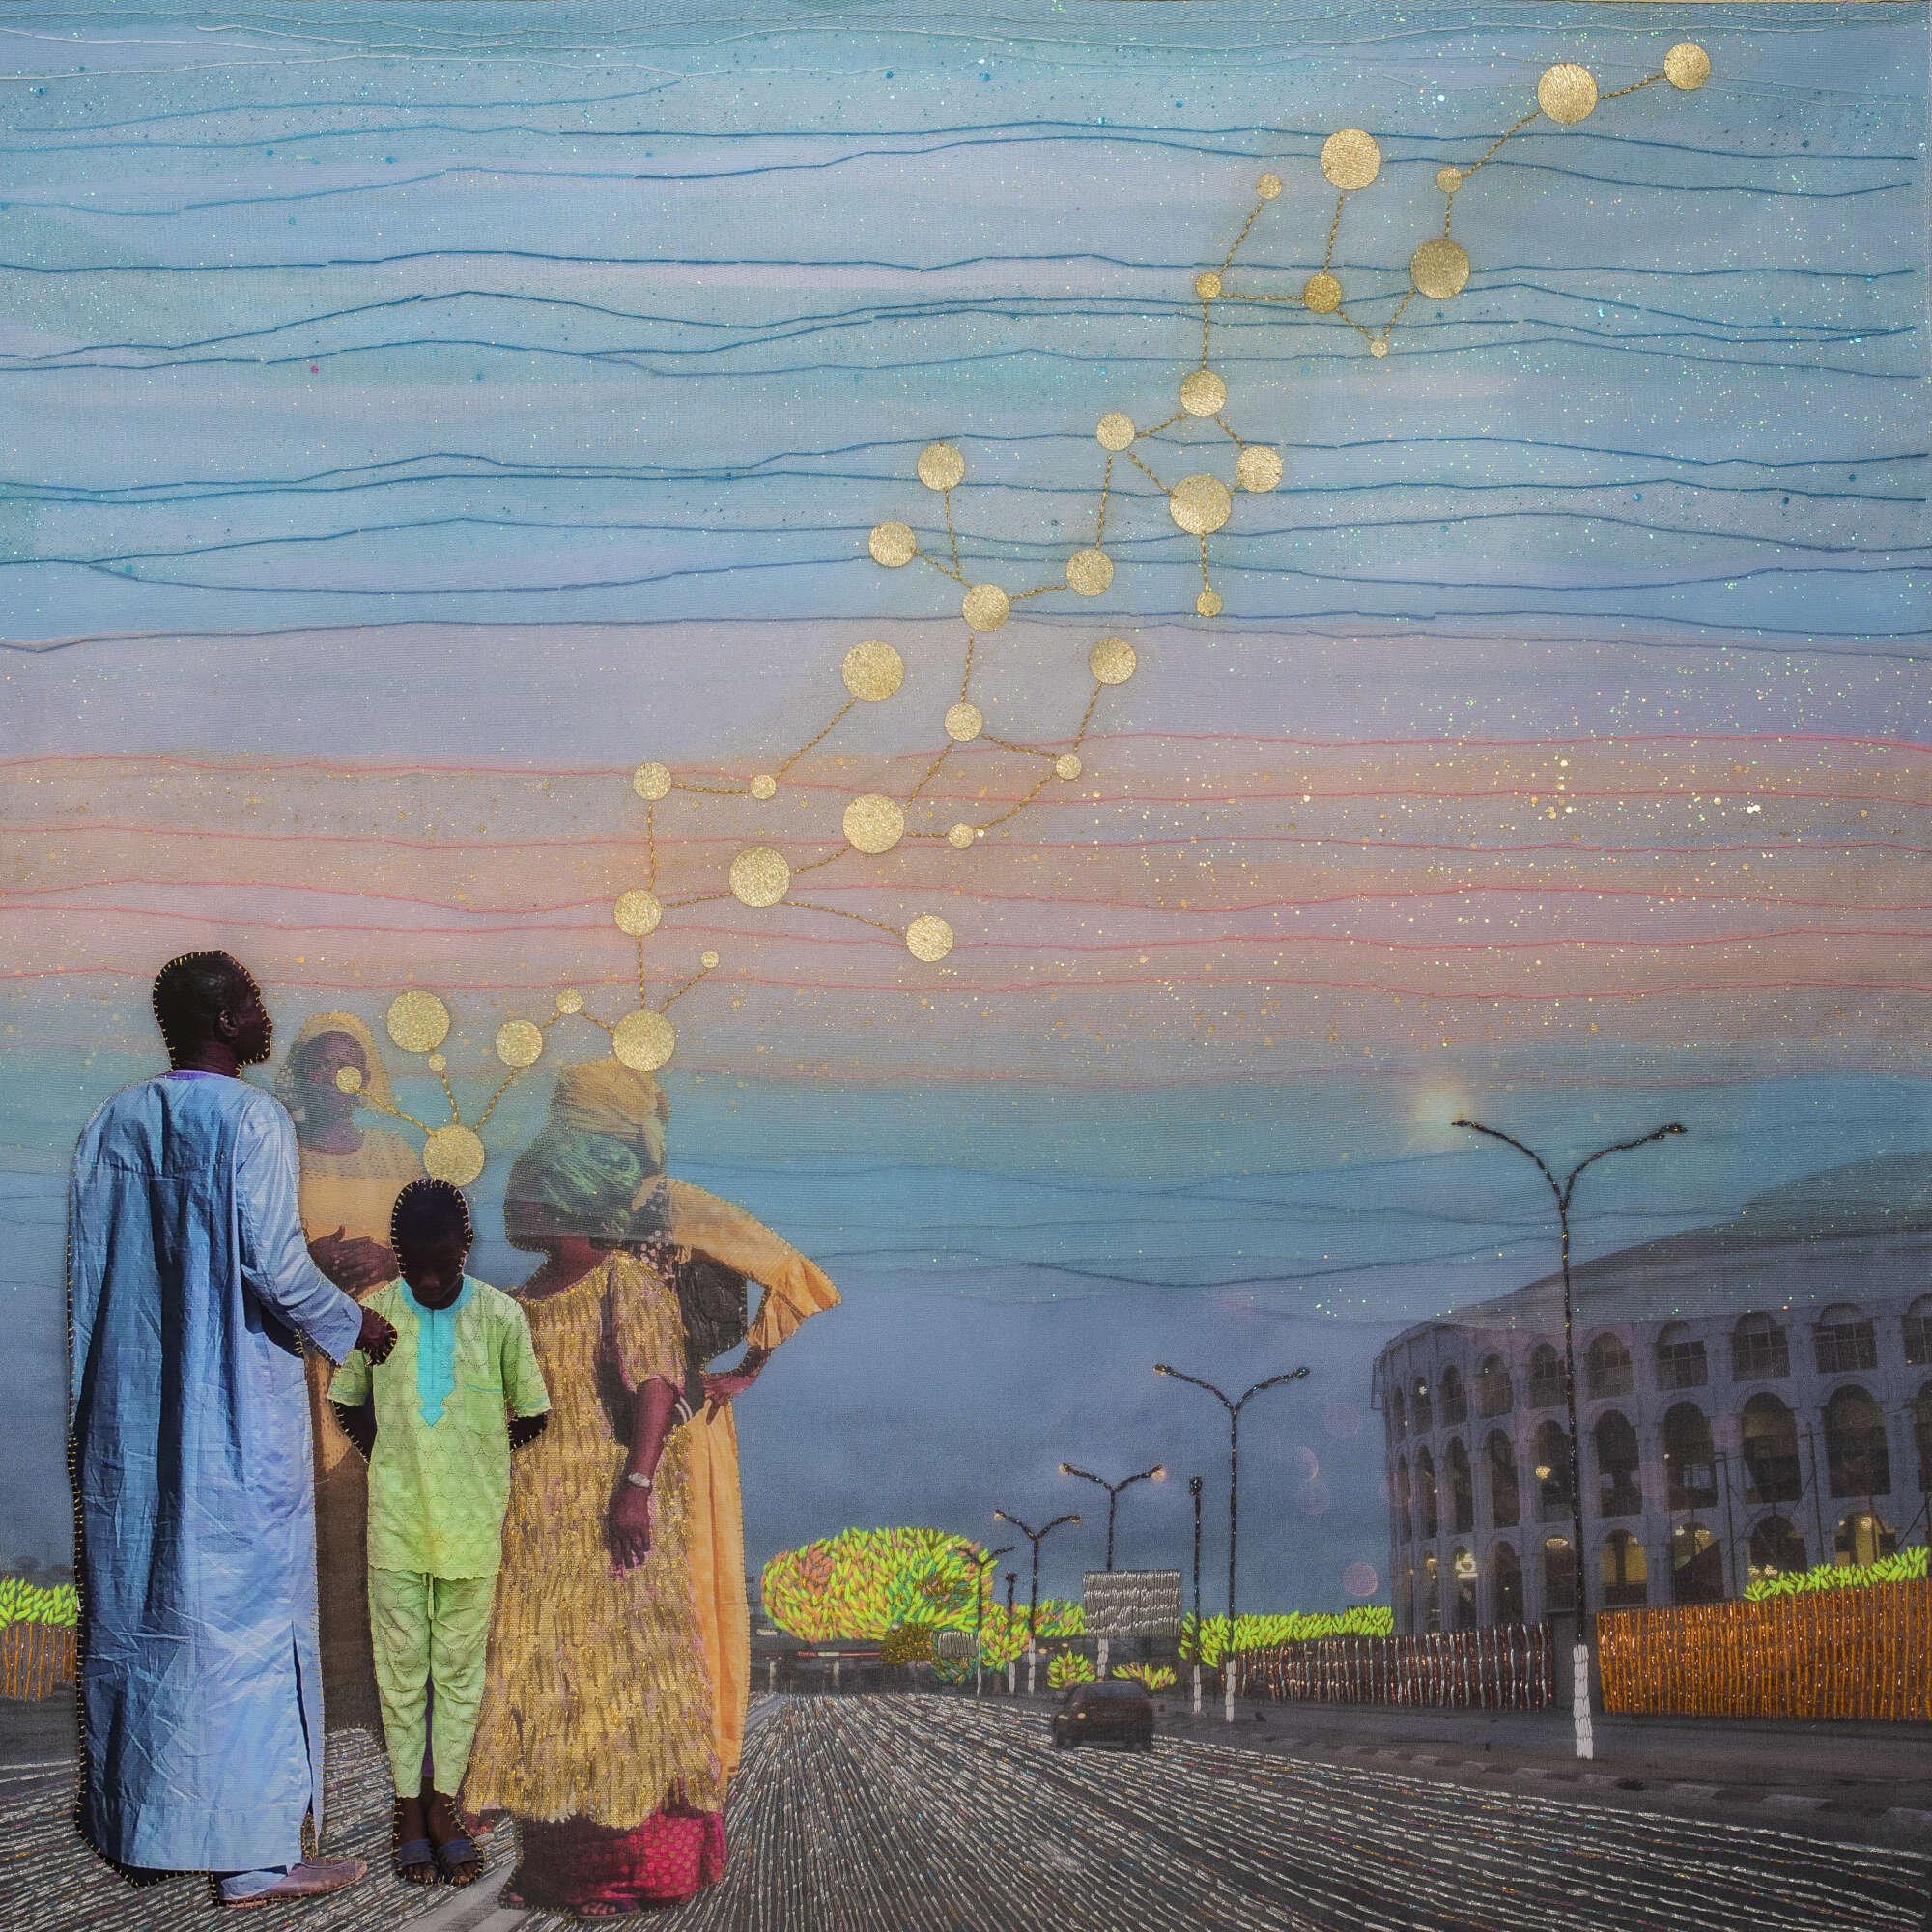 Joana Choumali, GREAT EXPECTATIONS (2019). Series ALBAHIAN, 80x80cm. Image copyright the artist and courtesy Gallery 1957, Accra